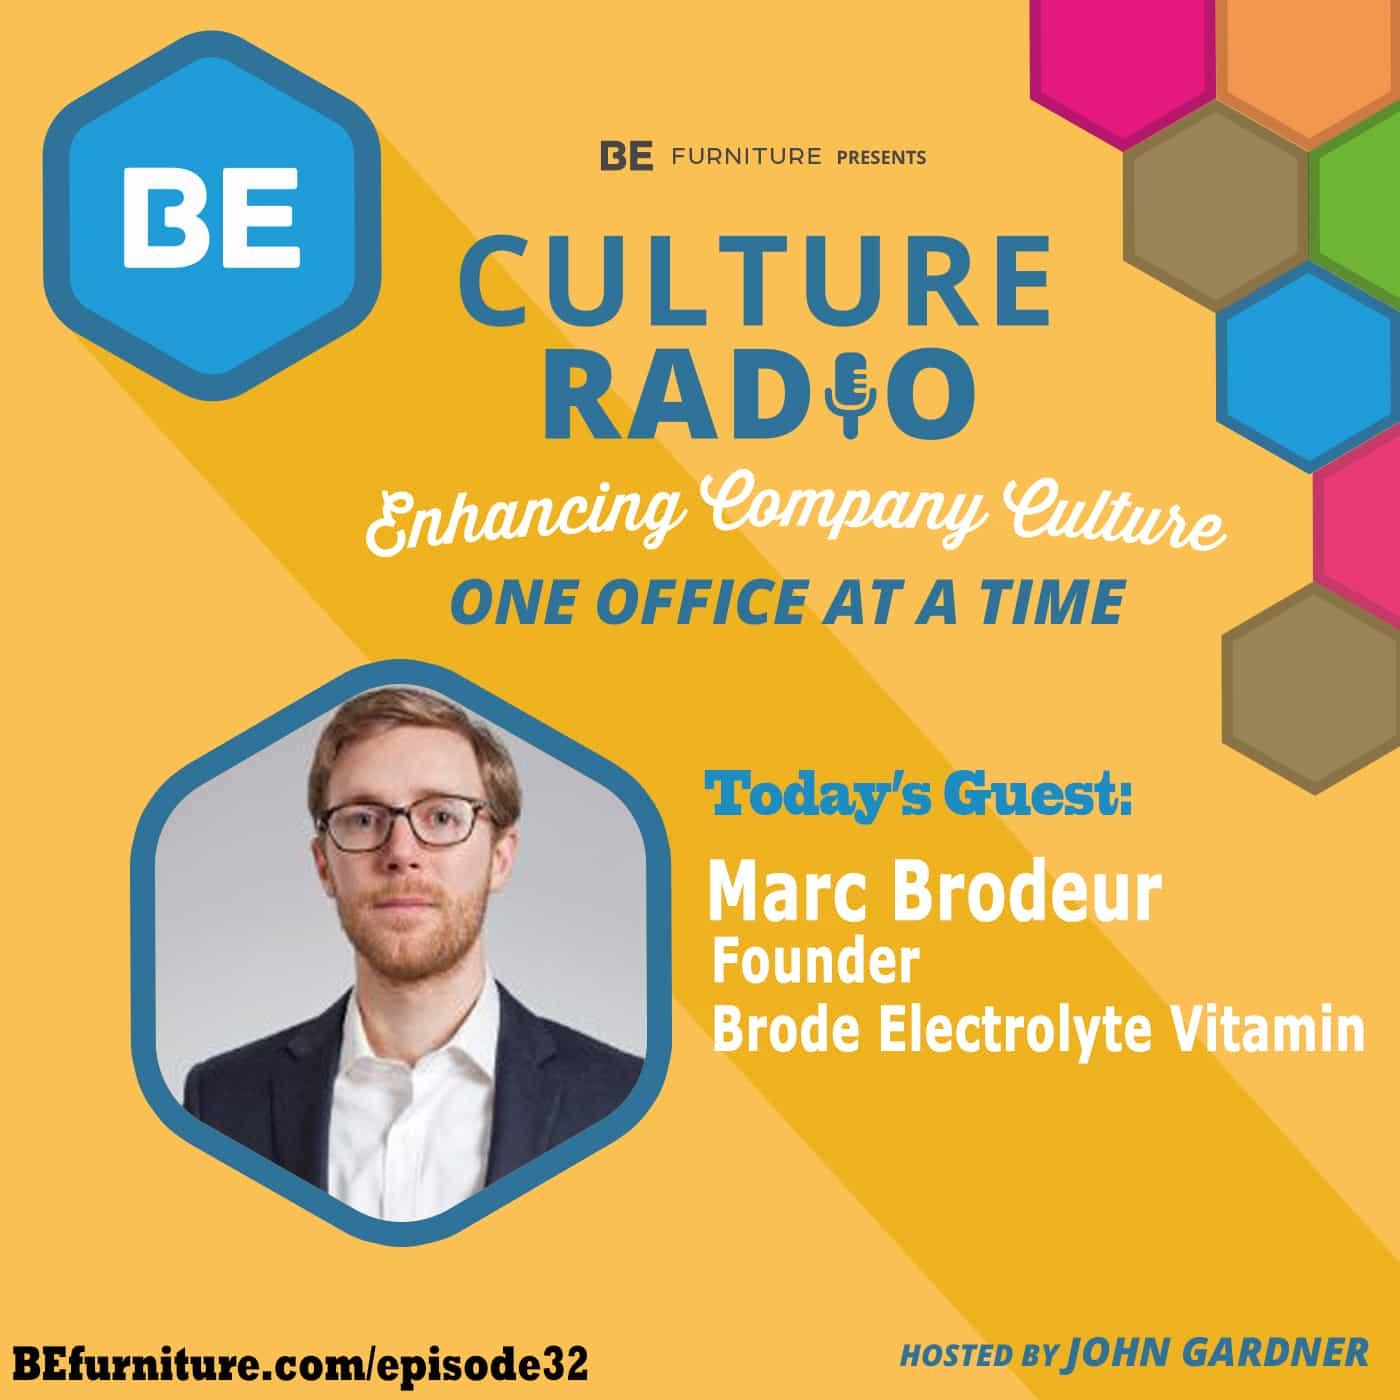 Marc Brodeur - Founder, Brode Electrolyte Vitamin